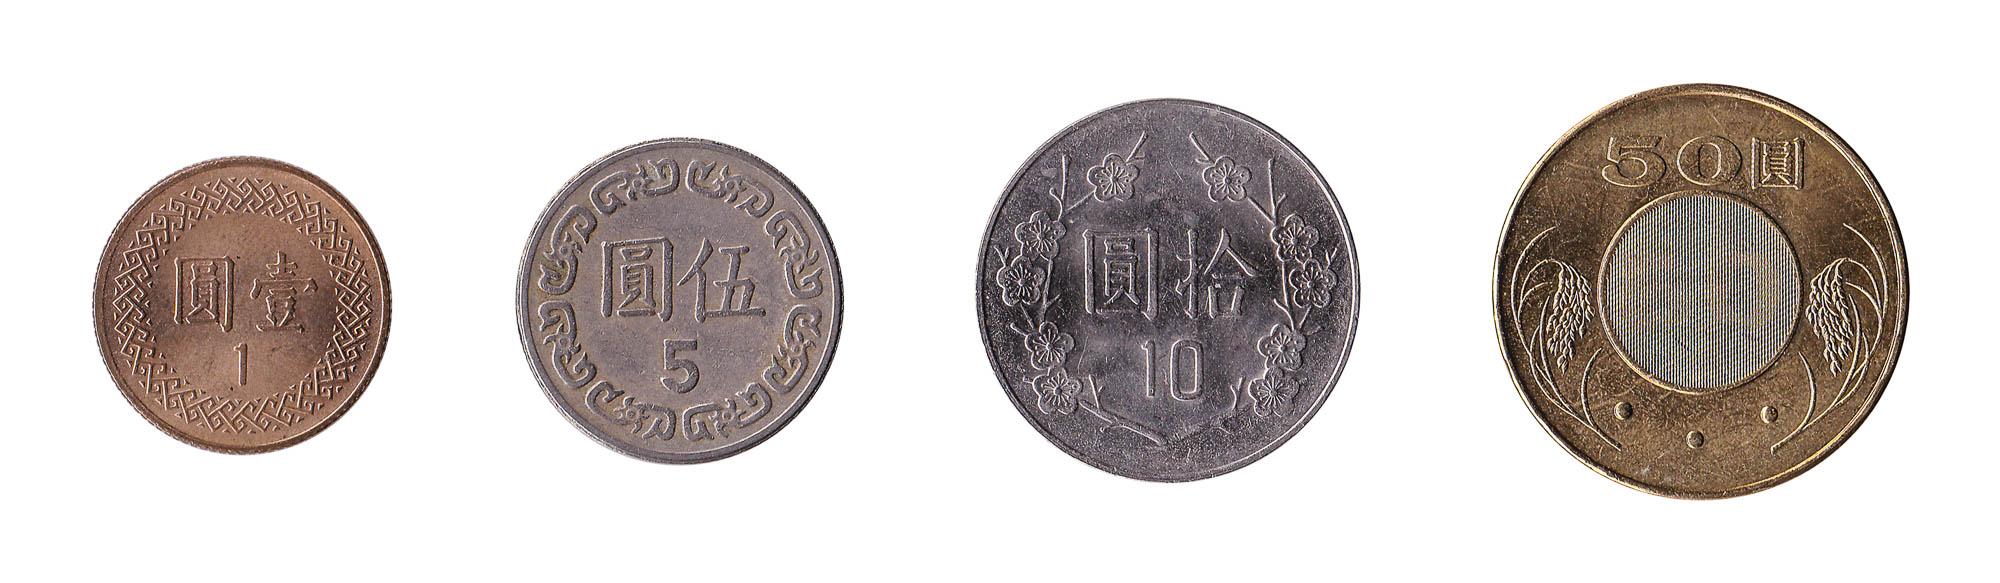 New Taiwan dollar coins